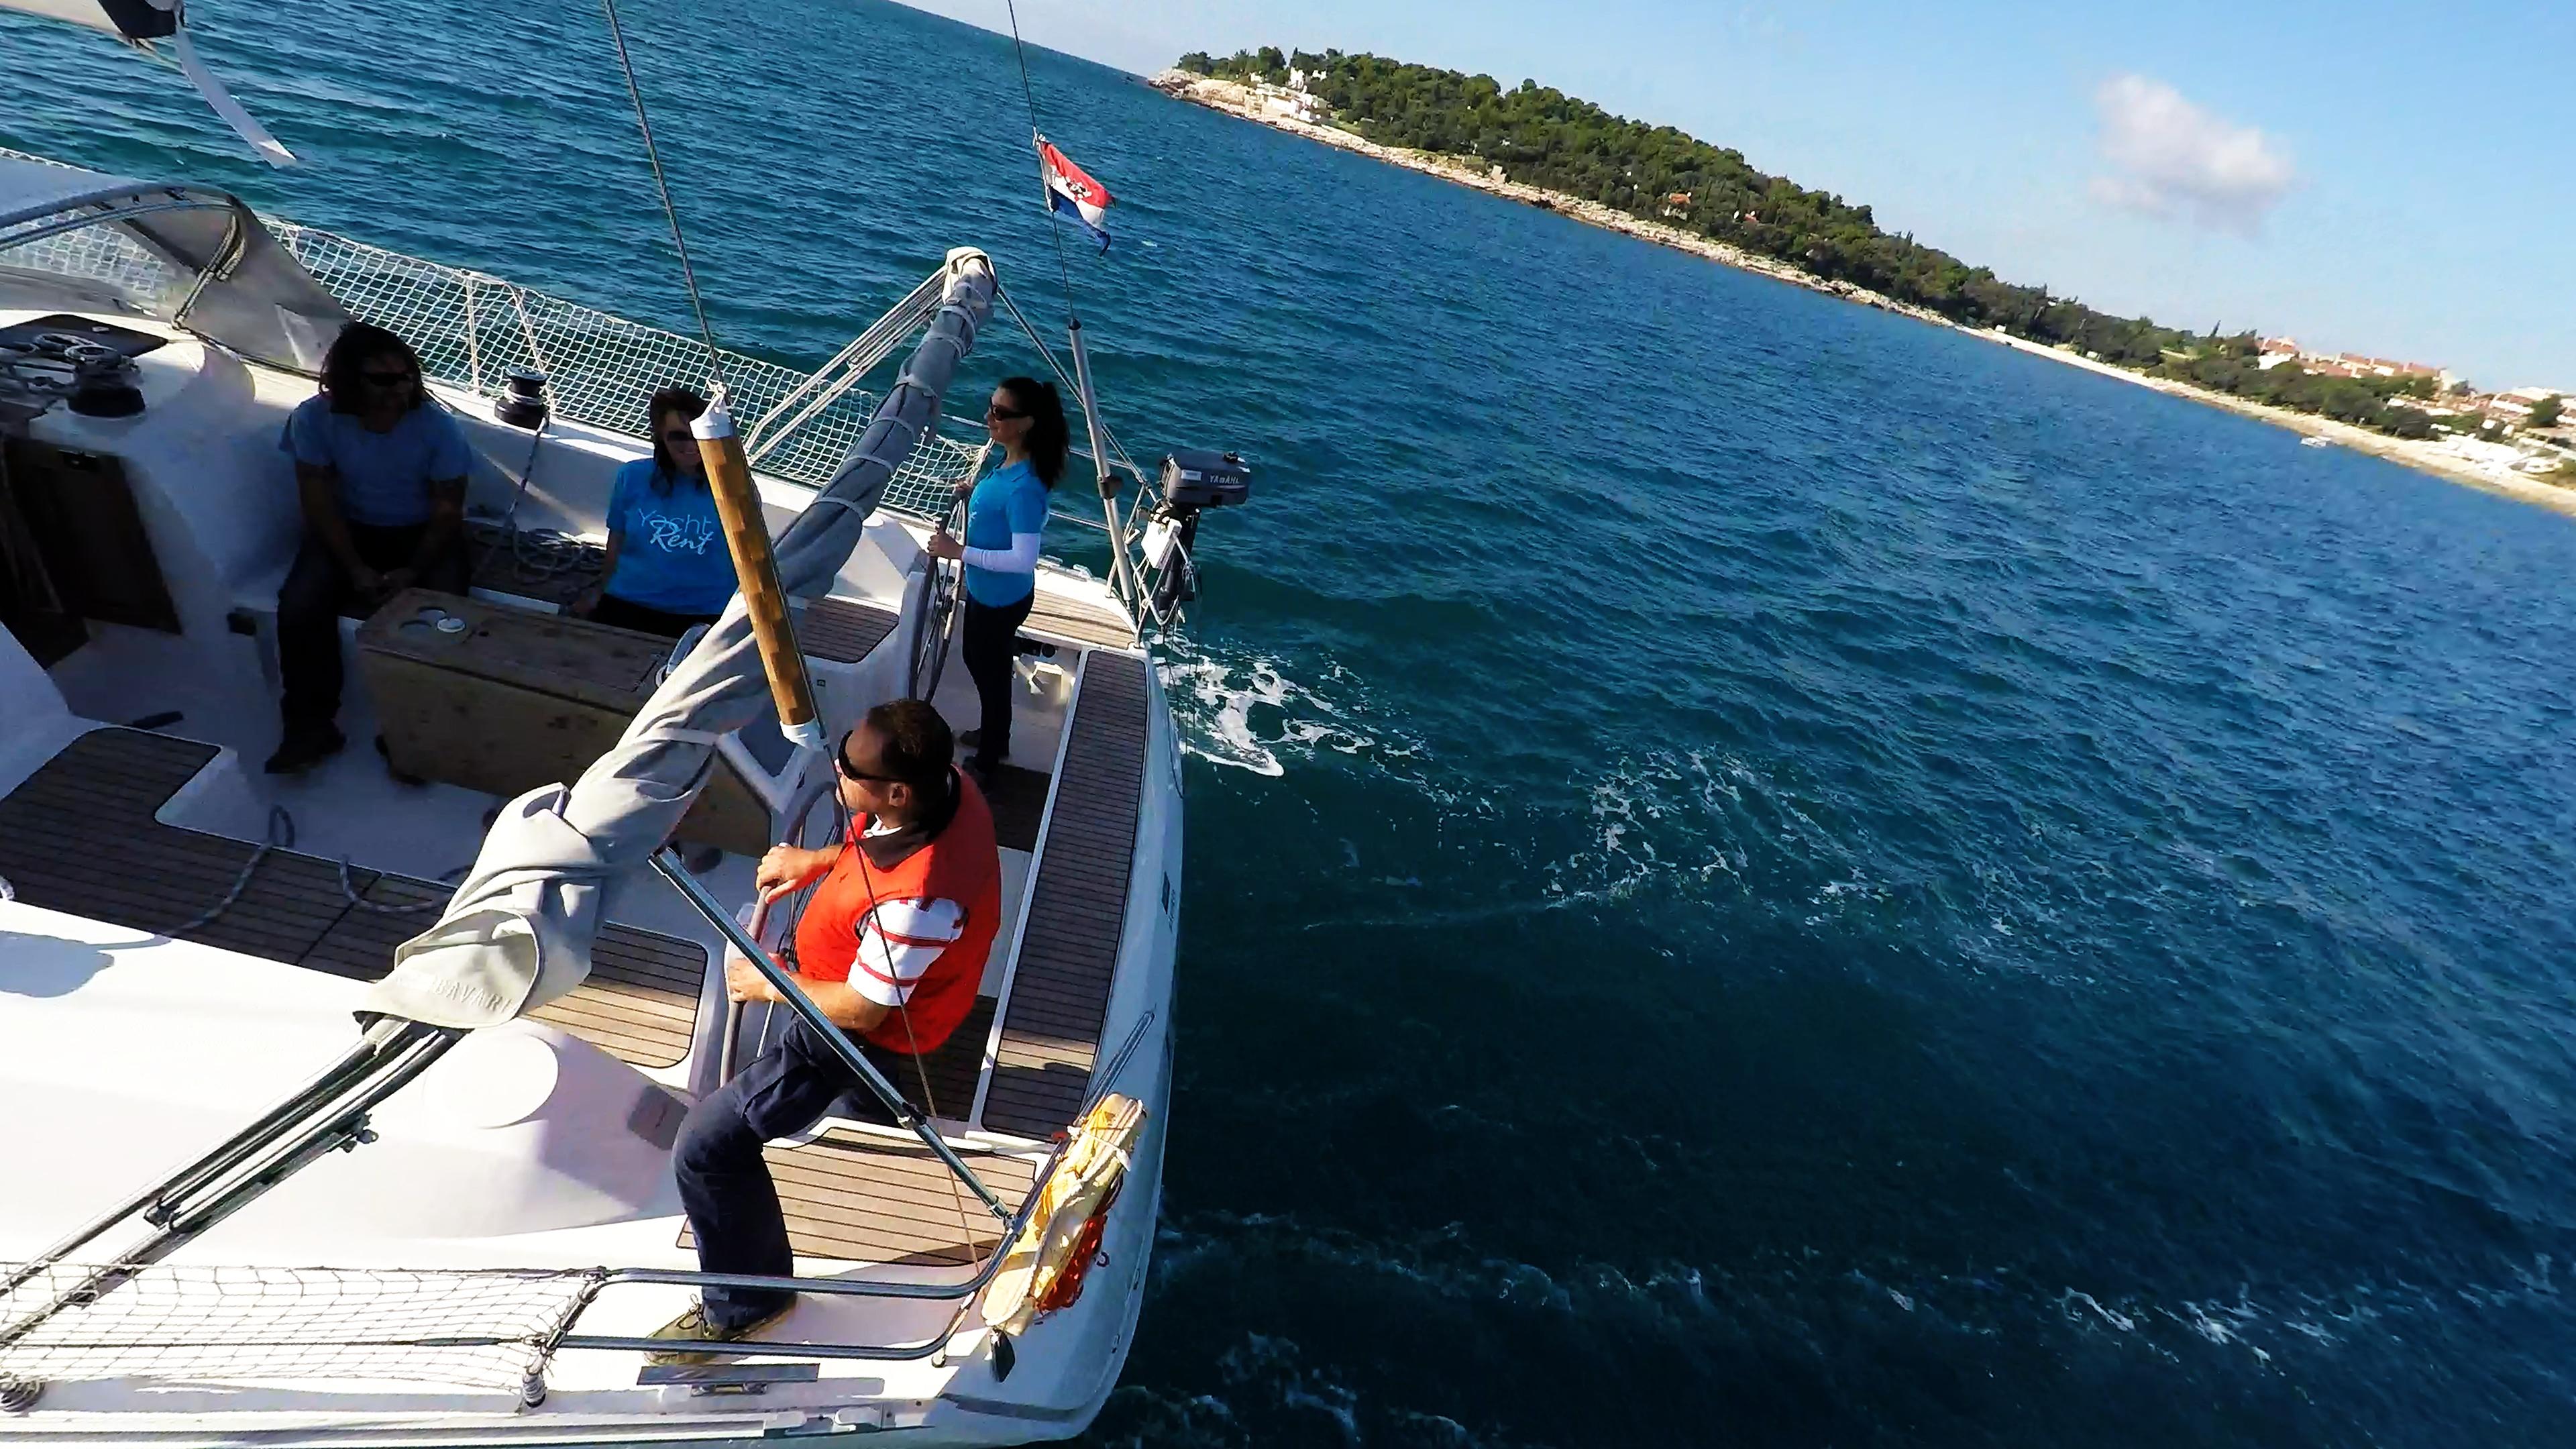 sailing yacht team crew cockpit skipper steering wheels teak